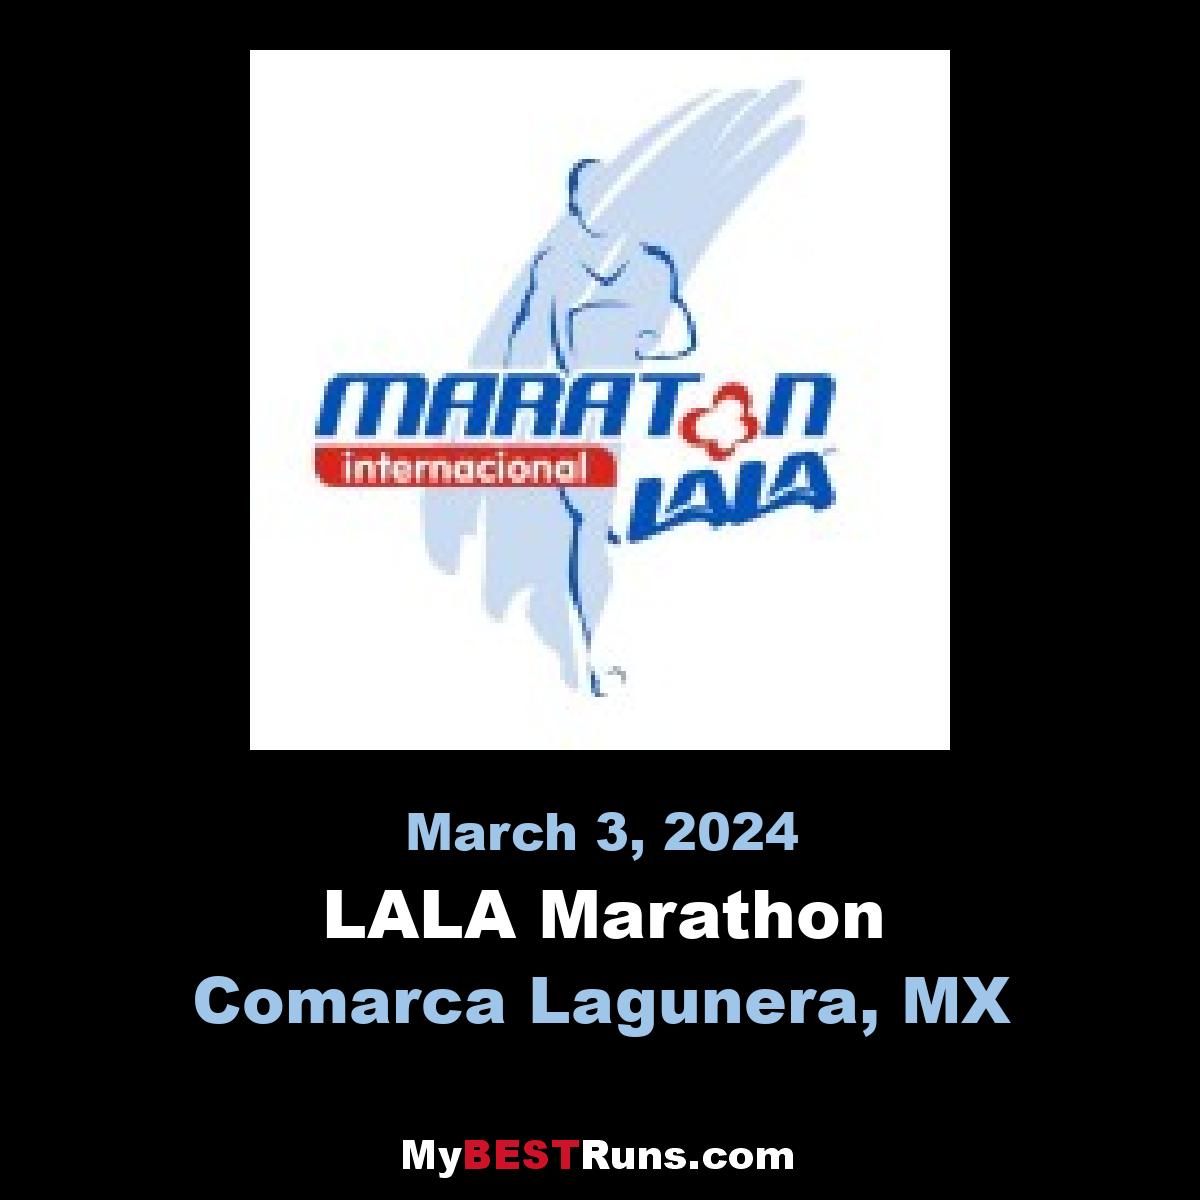 LALA Marathon